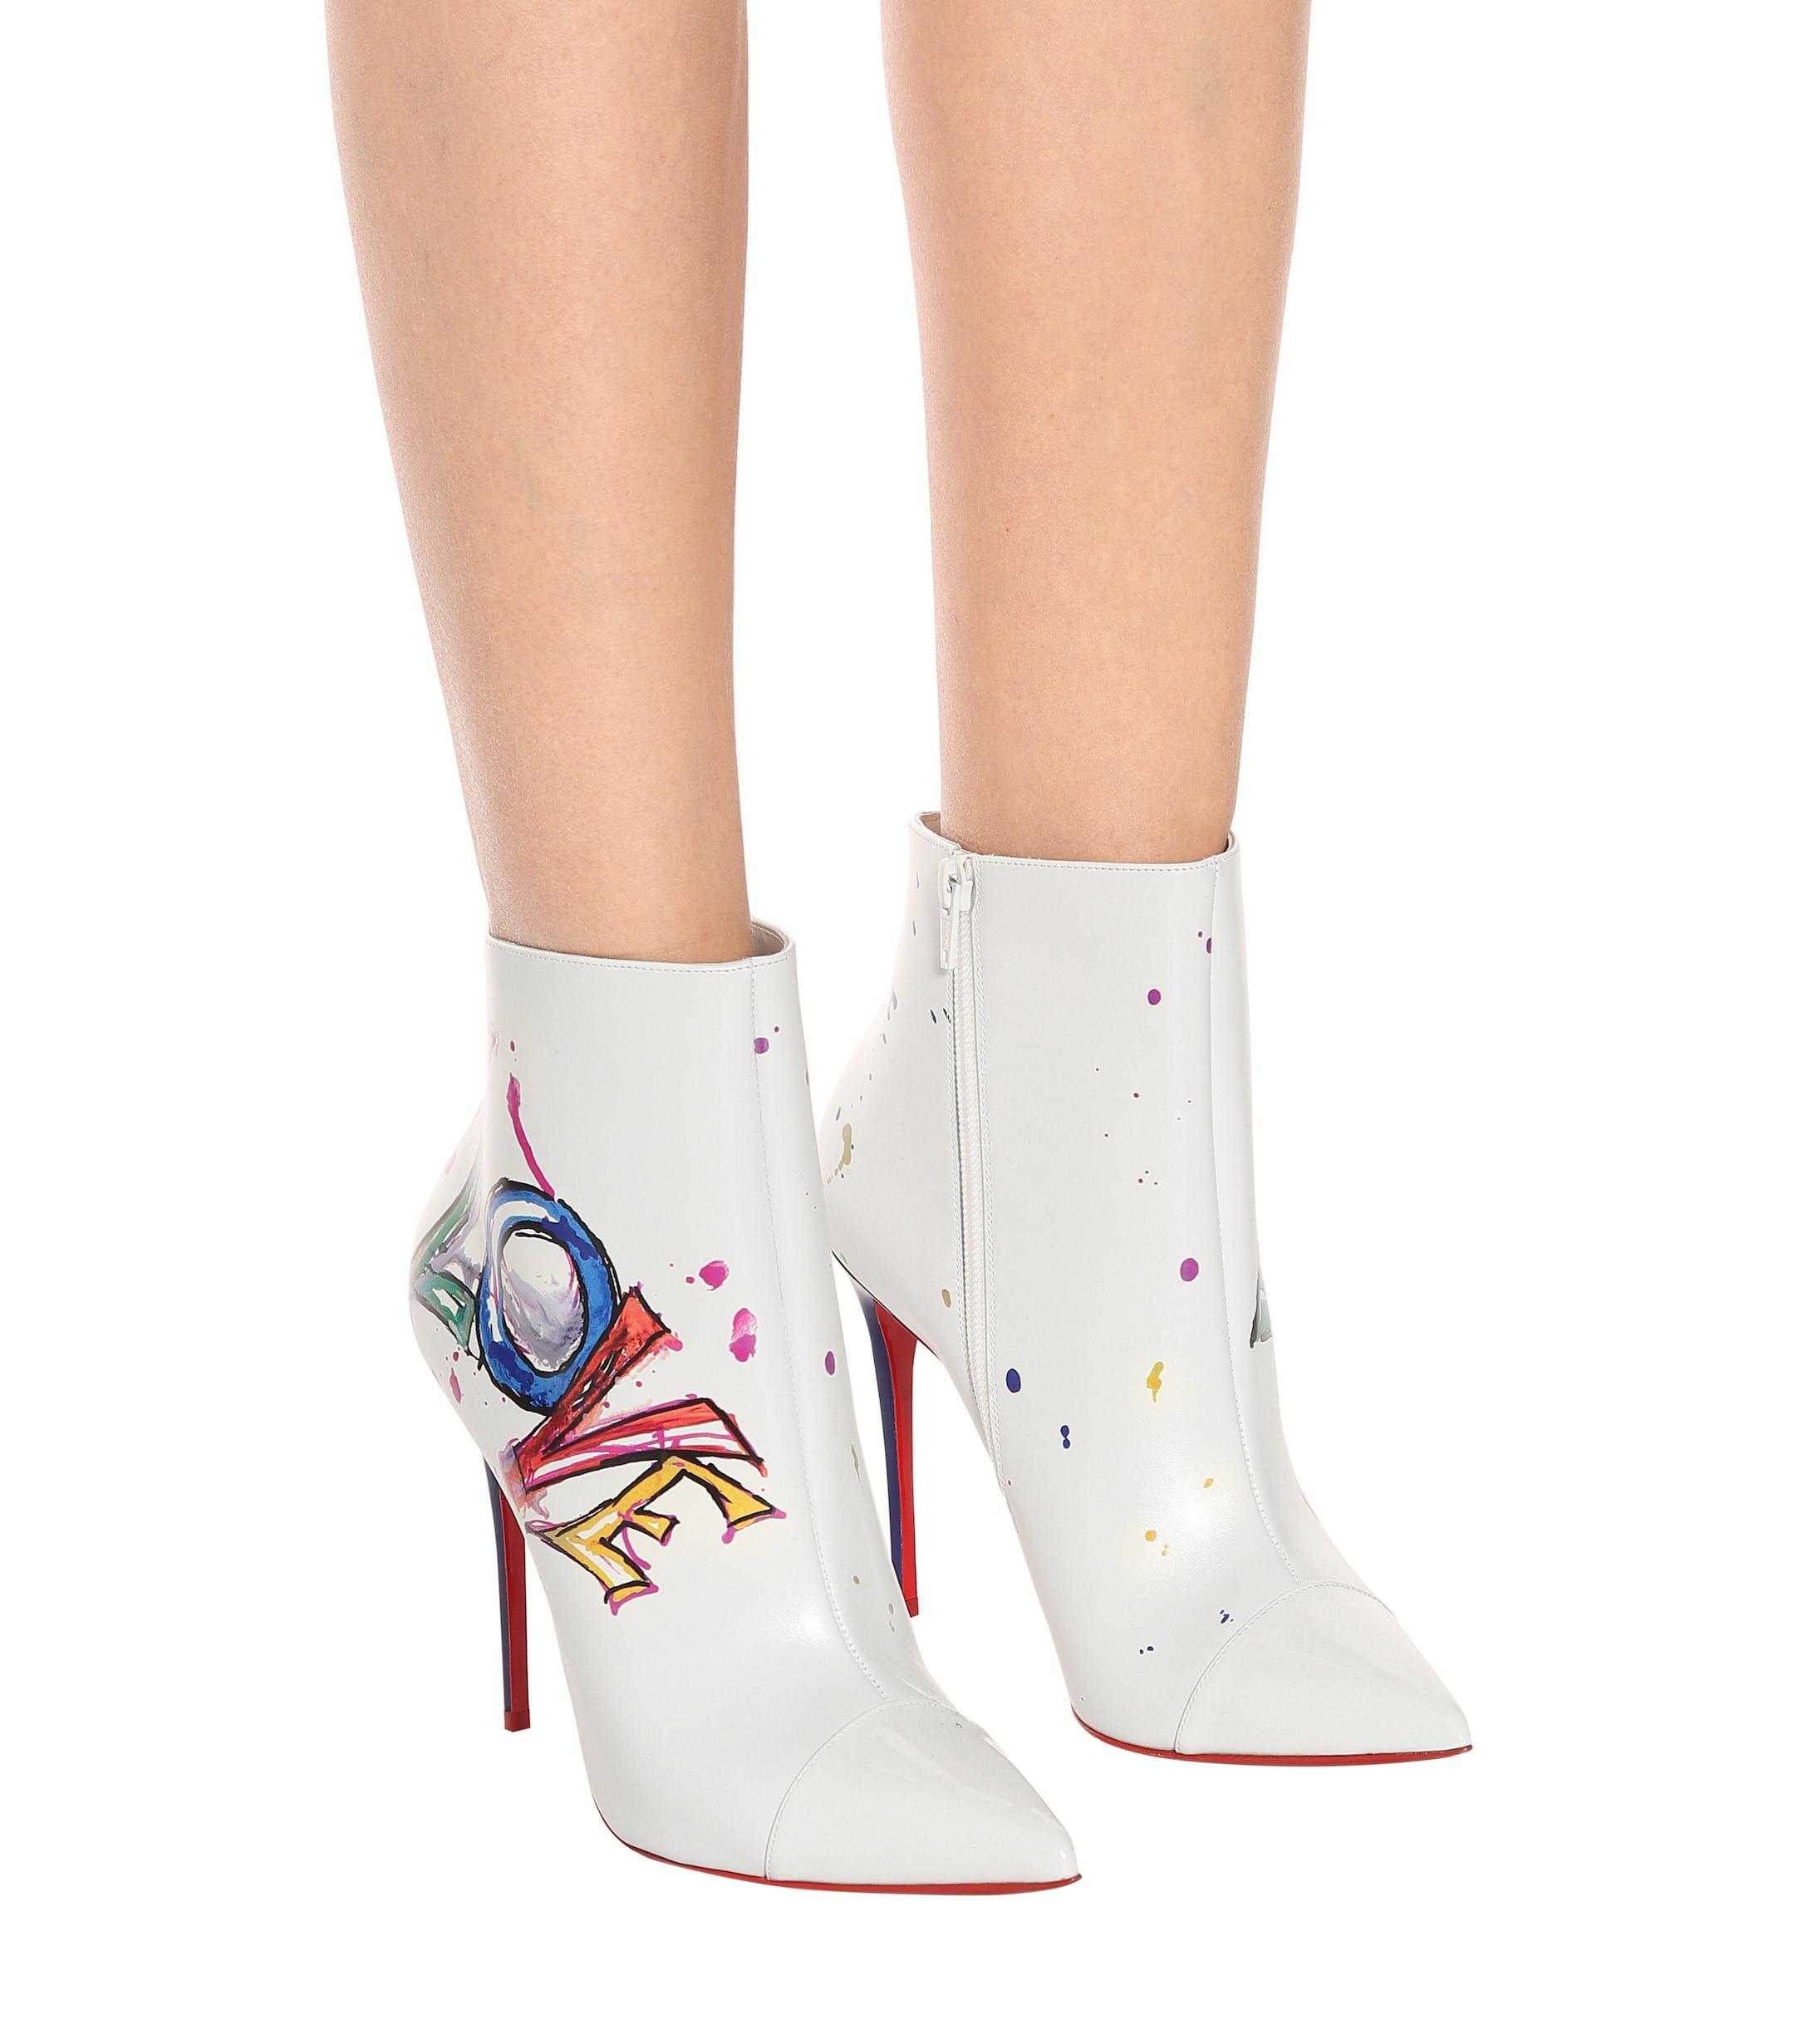 Botines Boot In Love de piel Christian Louboutin de color Blanco